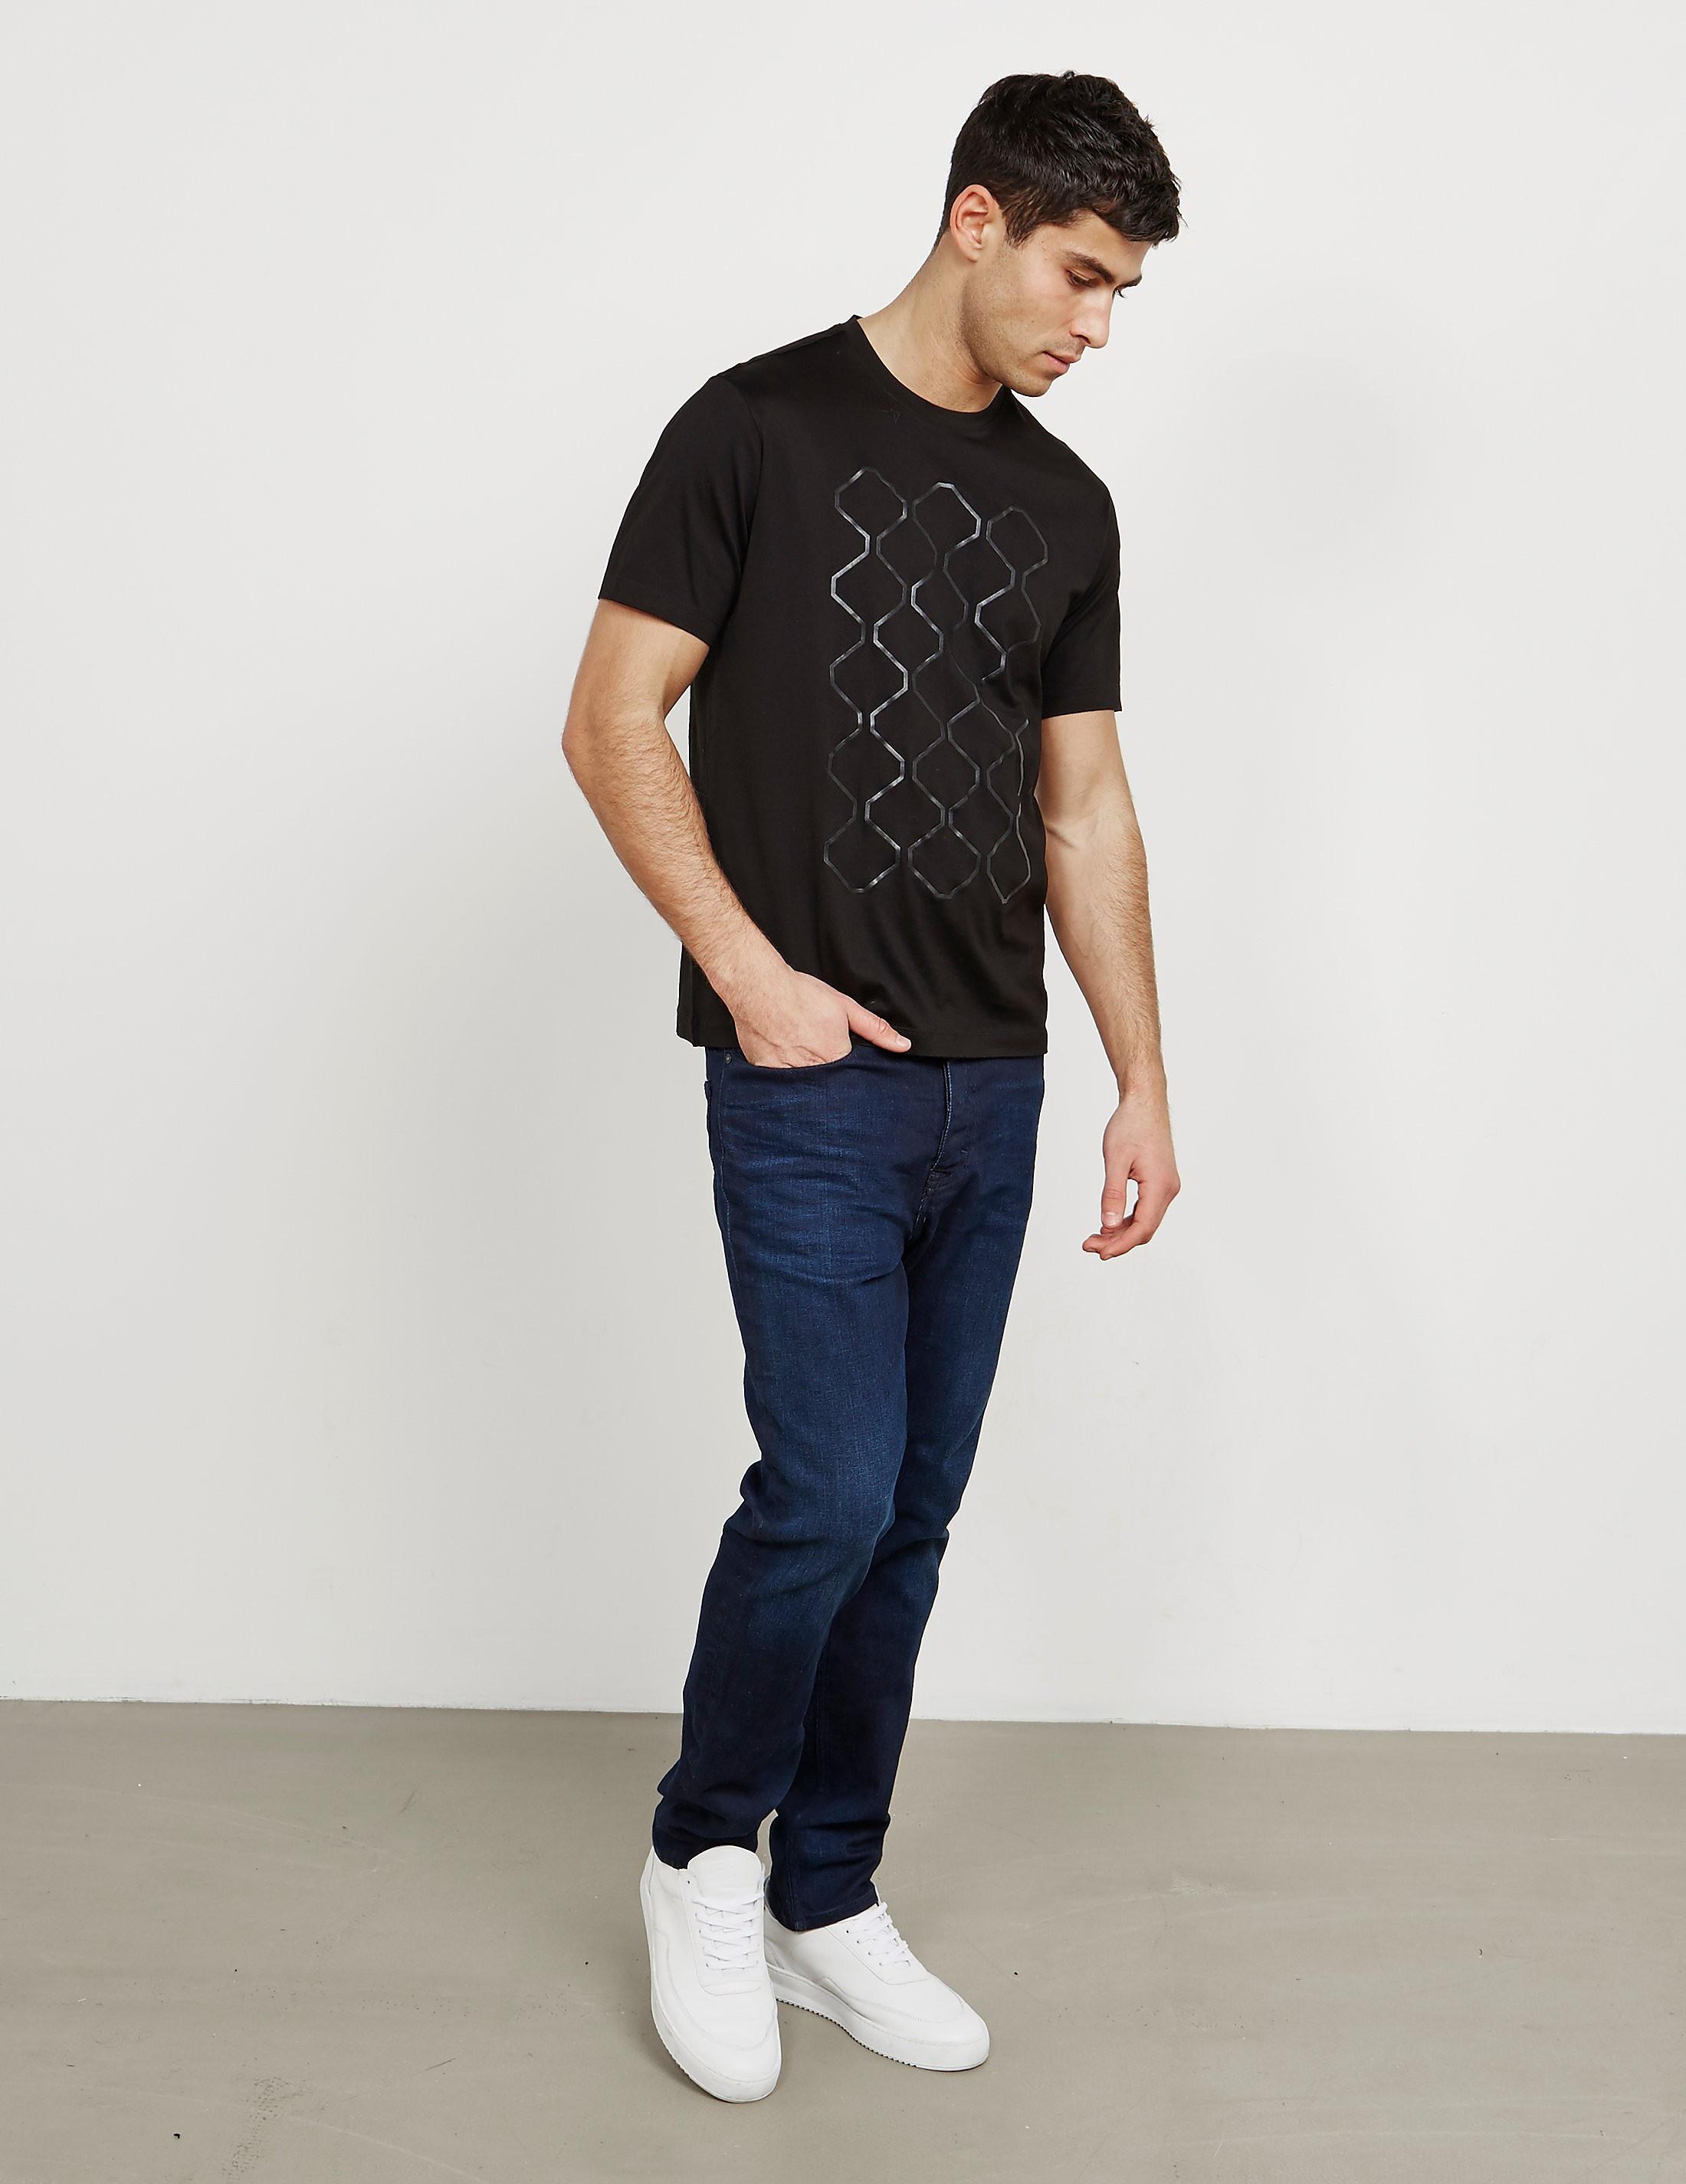 Z Zegna Honeycomb Short Sleeve T-Shirt